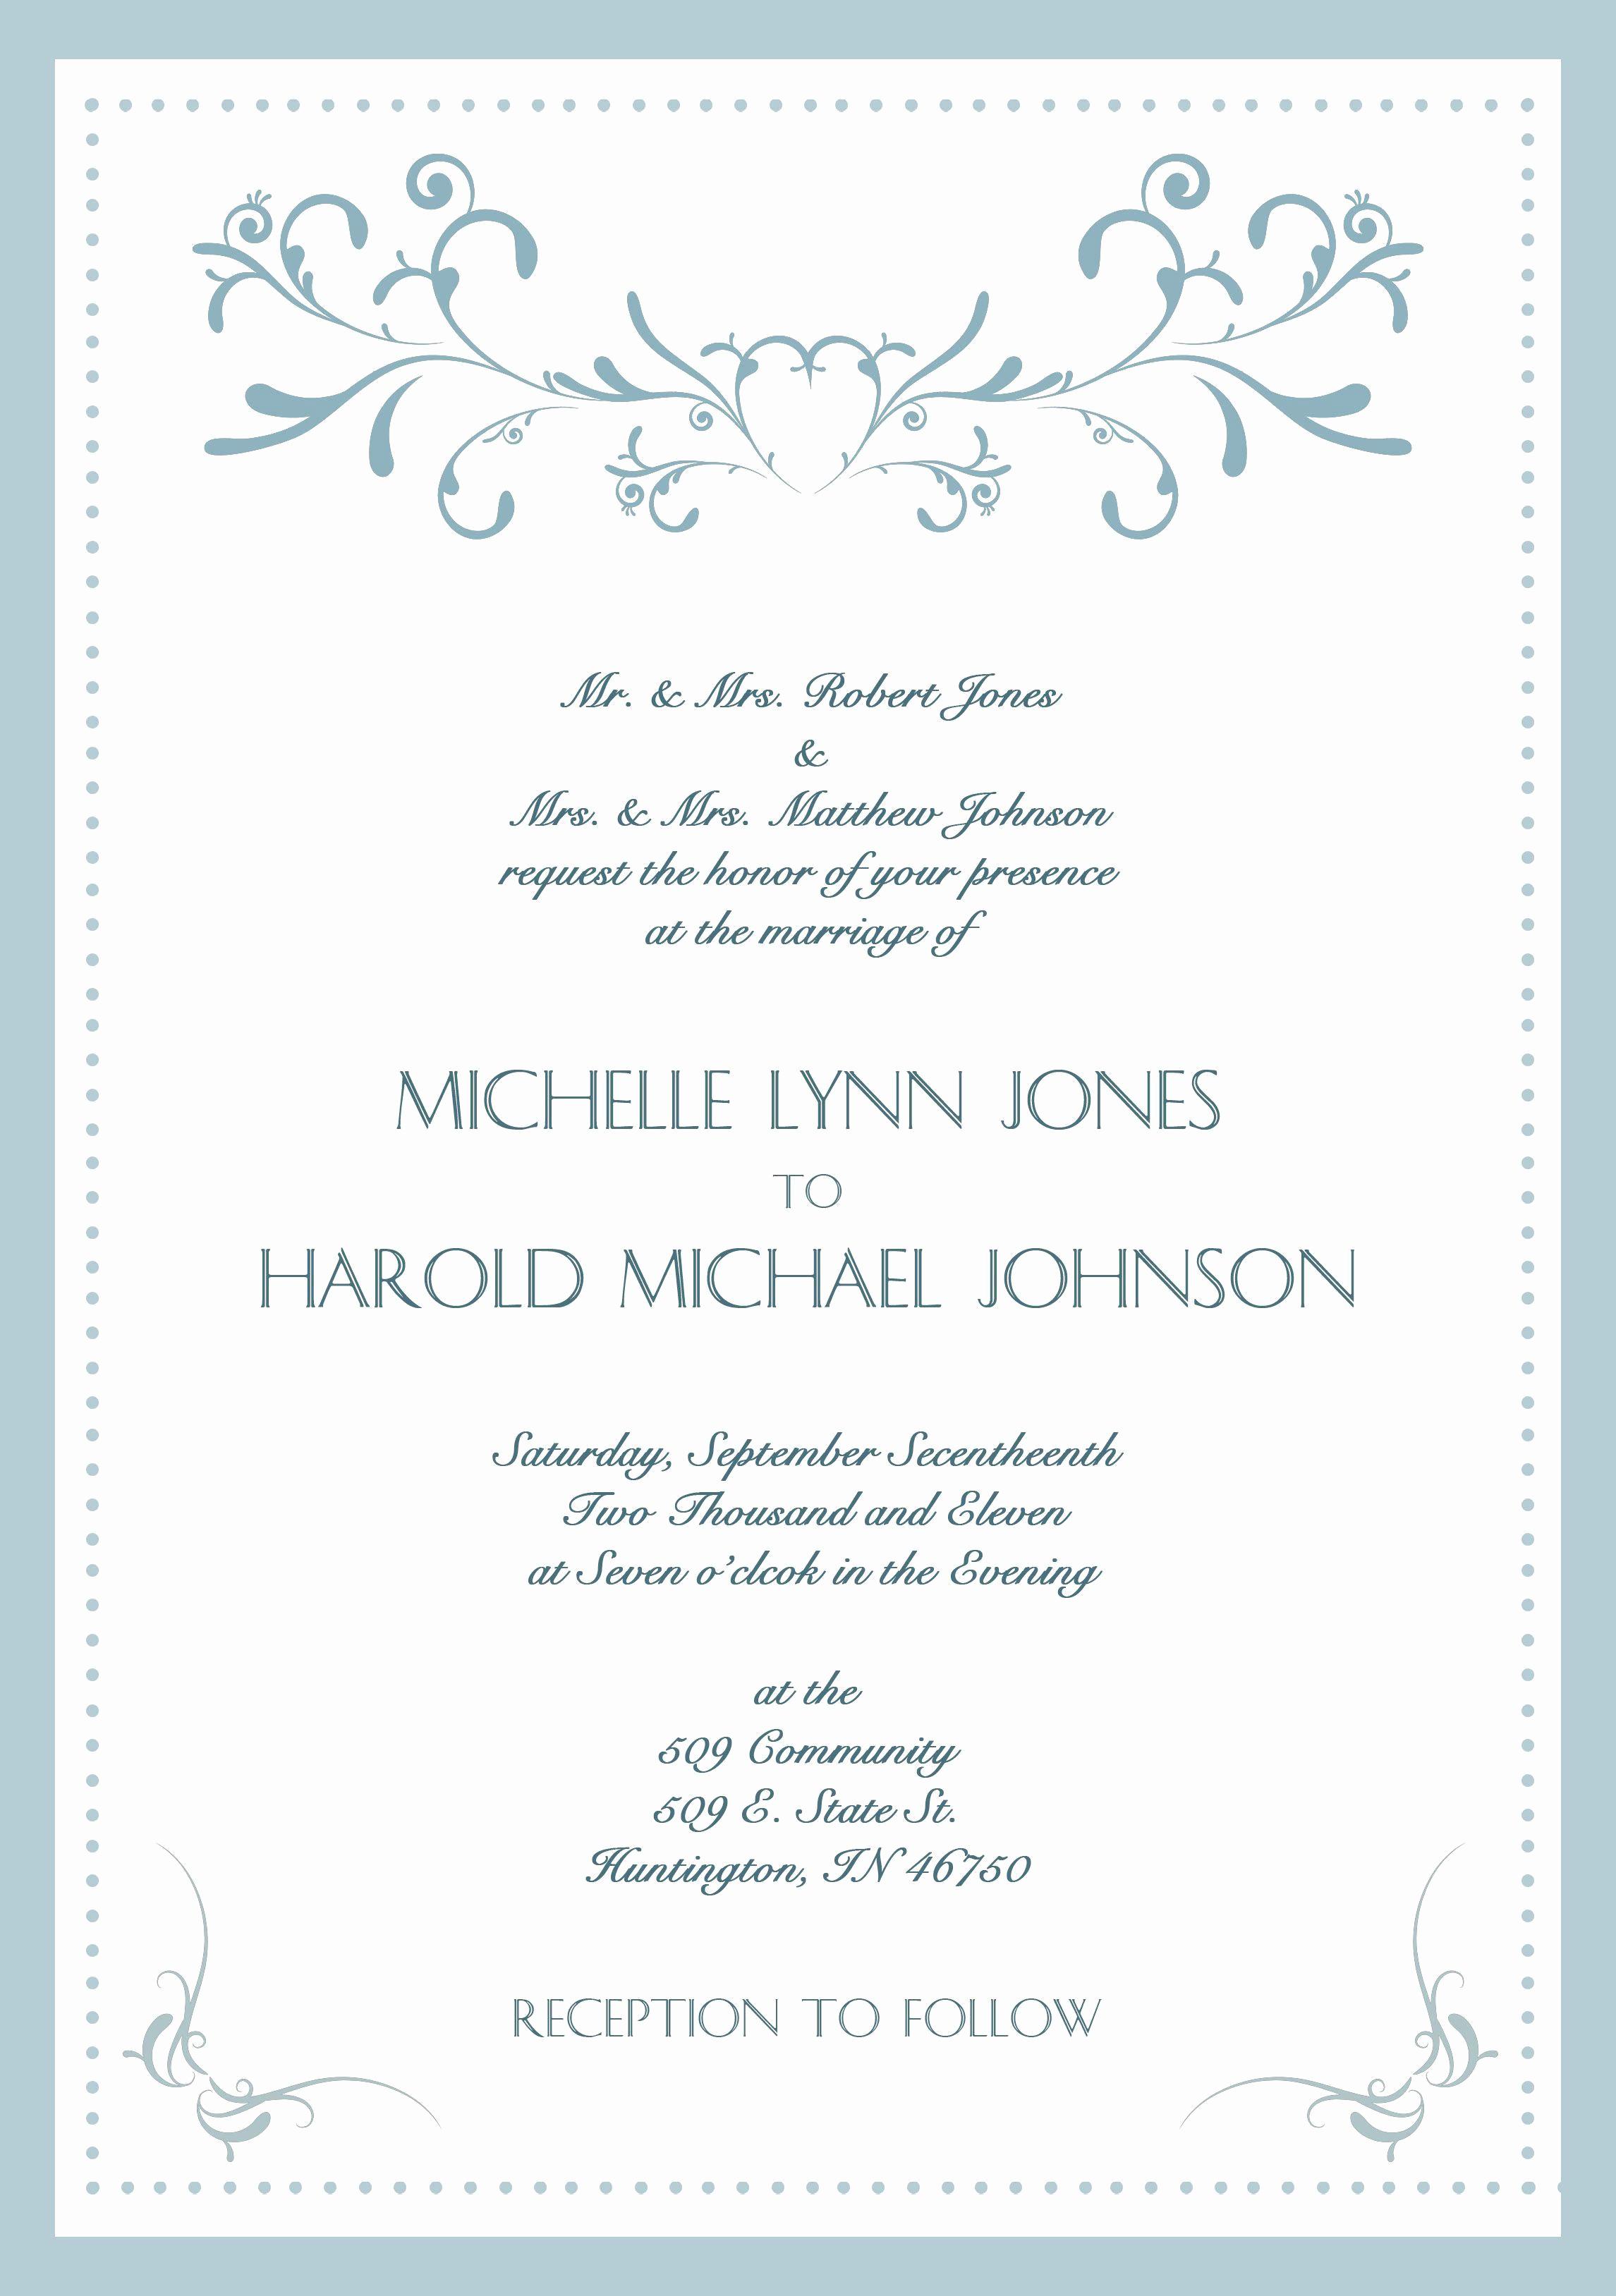 Sample Wedding Invitation Wording Lovely Sample Wedding Invitation Cards In English